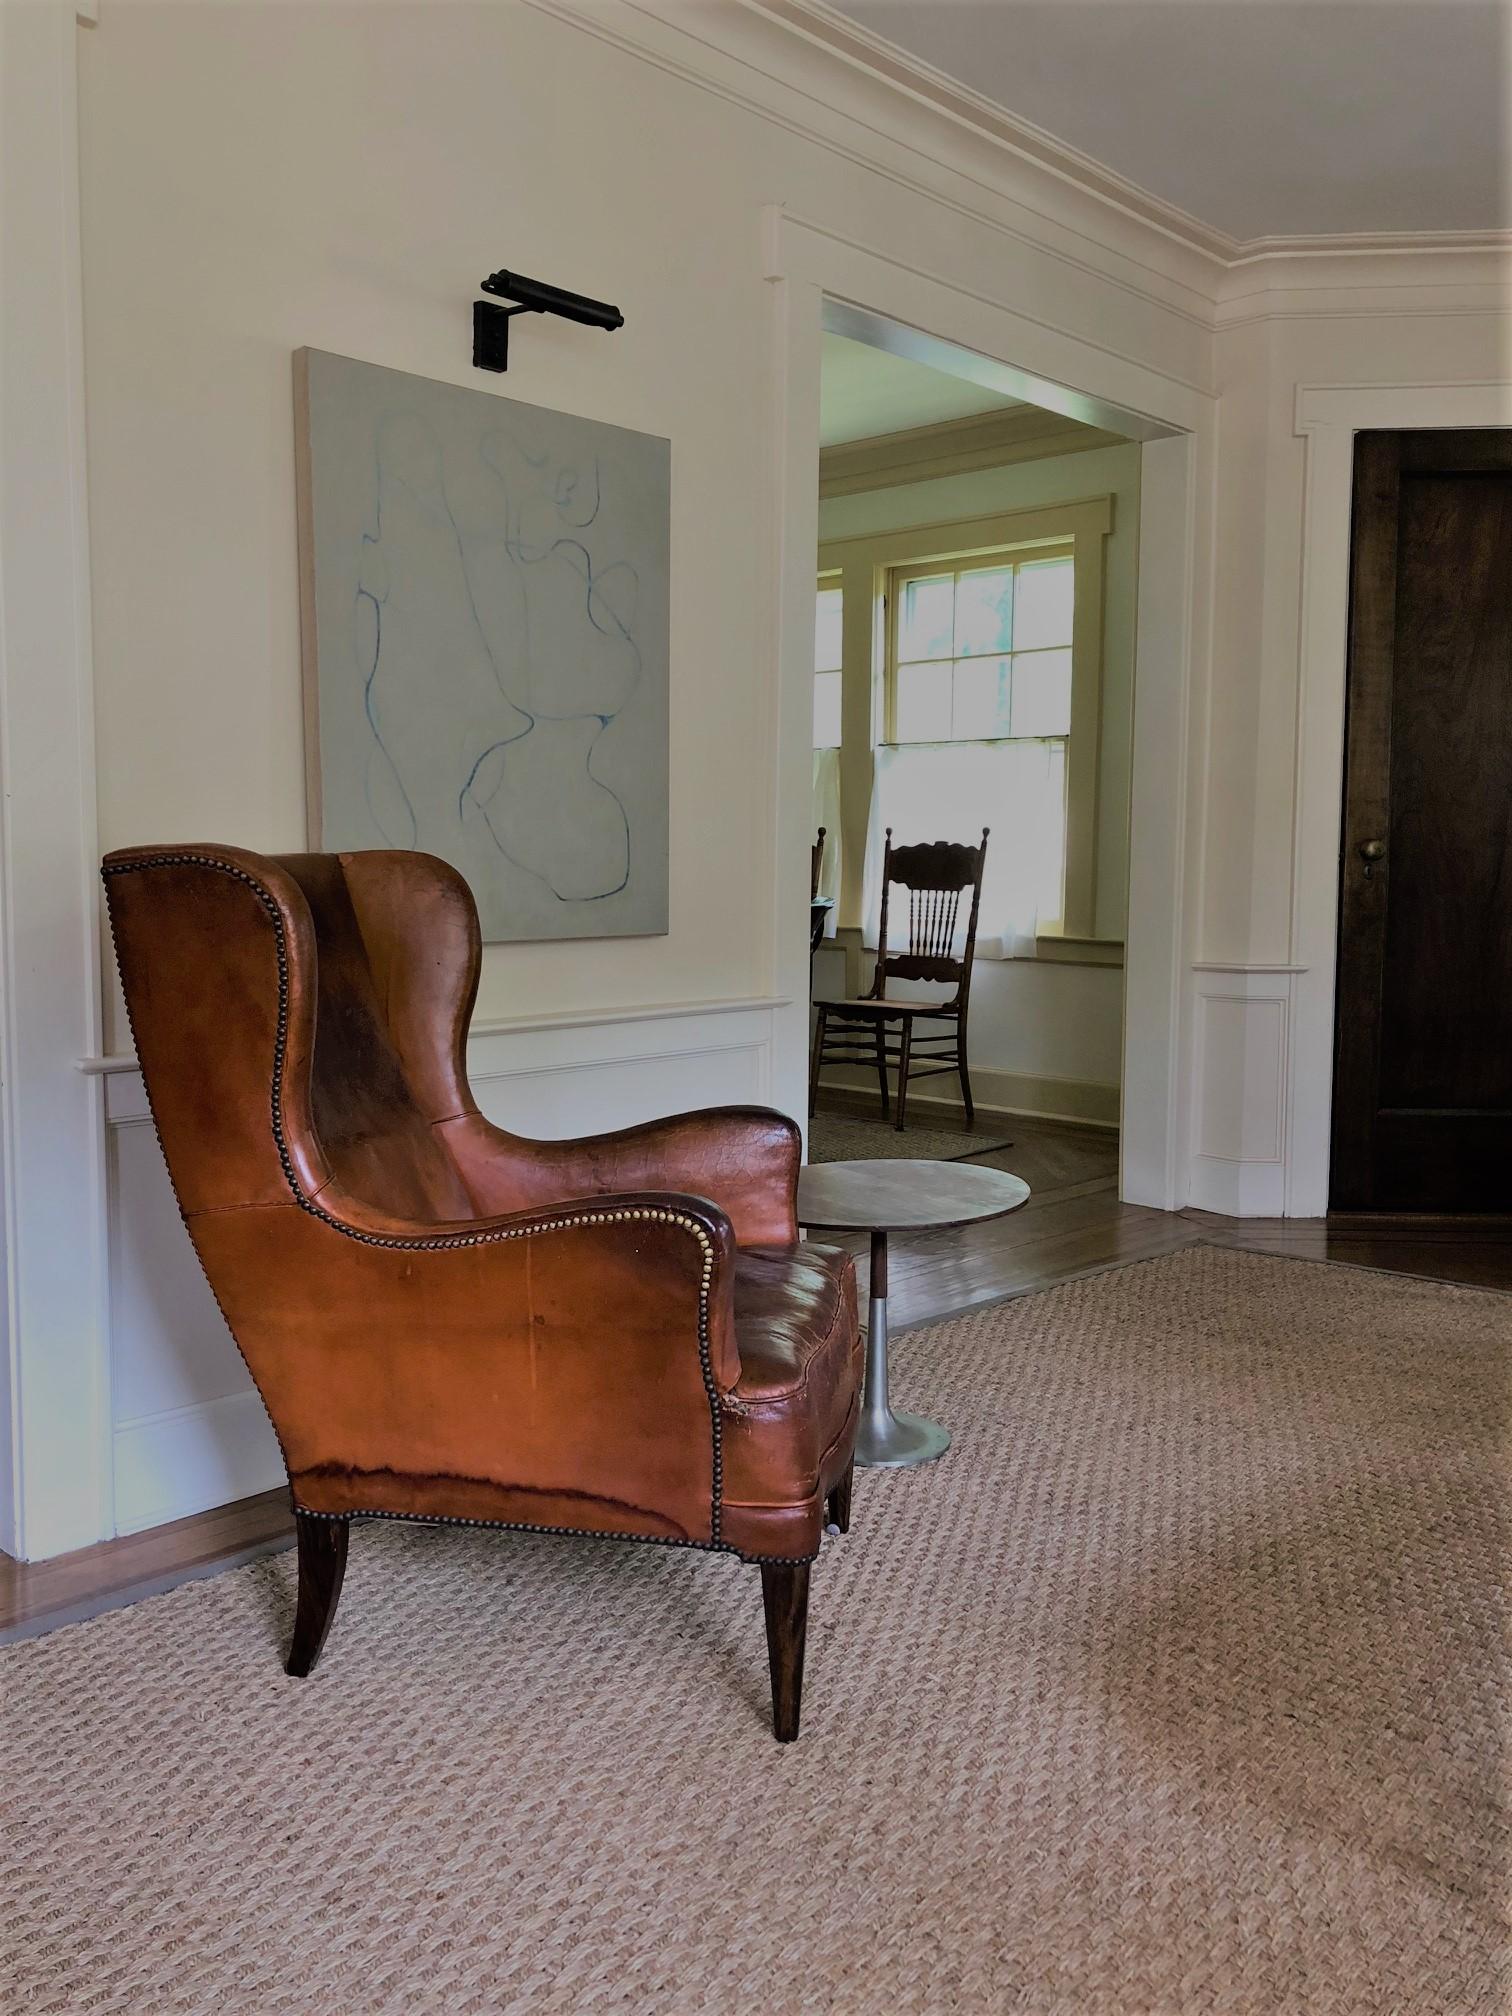 9. Leather Chair Sauna.jpg